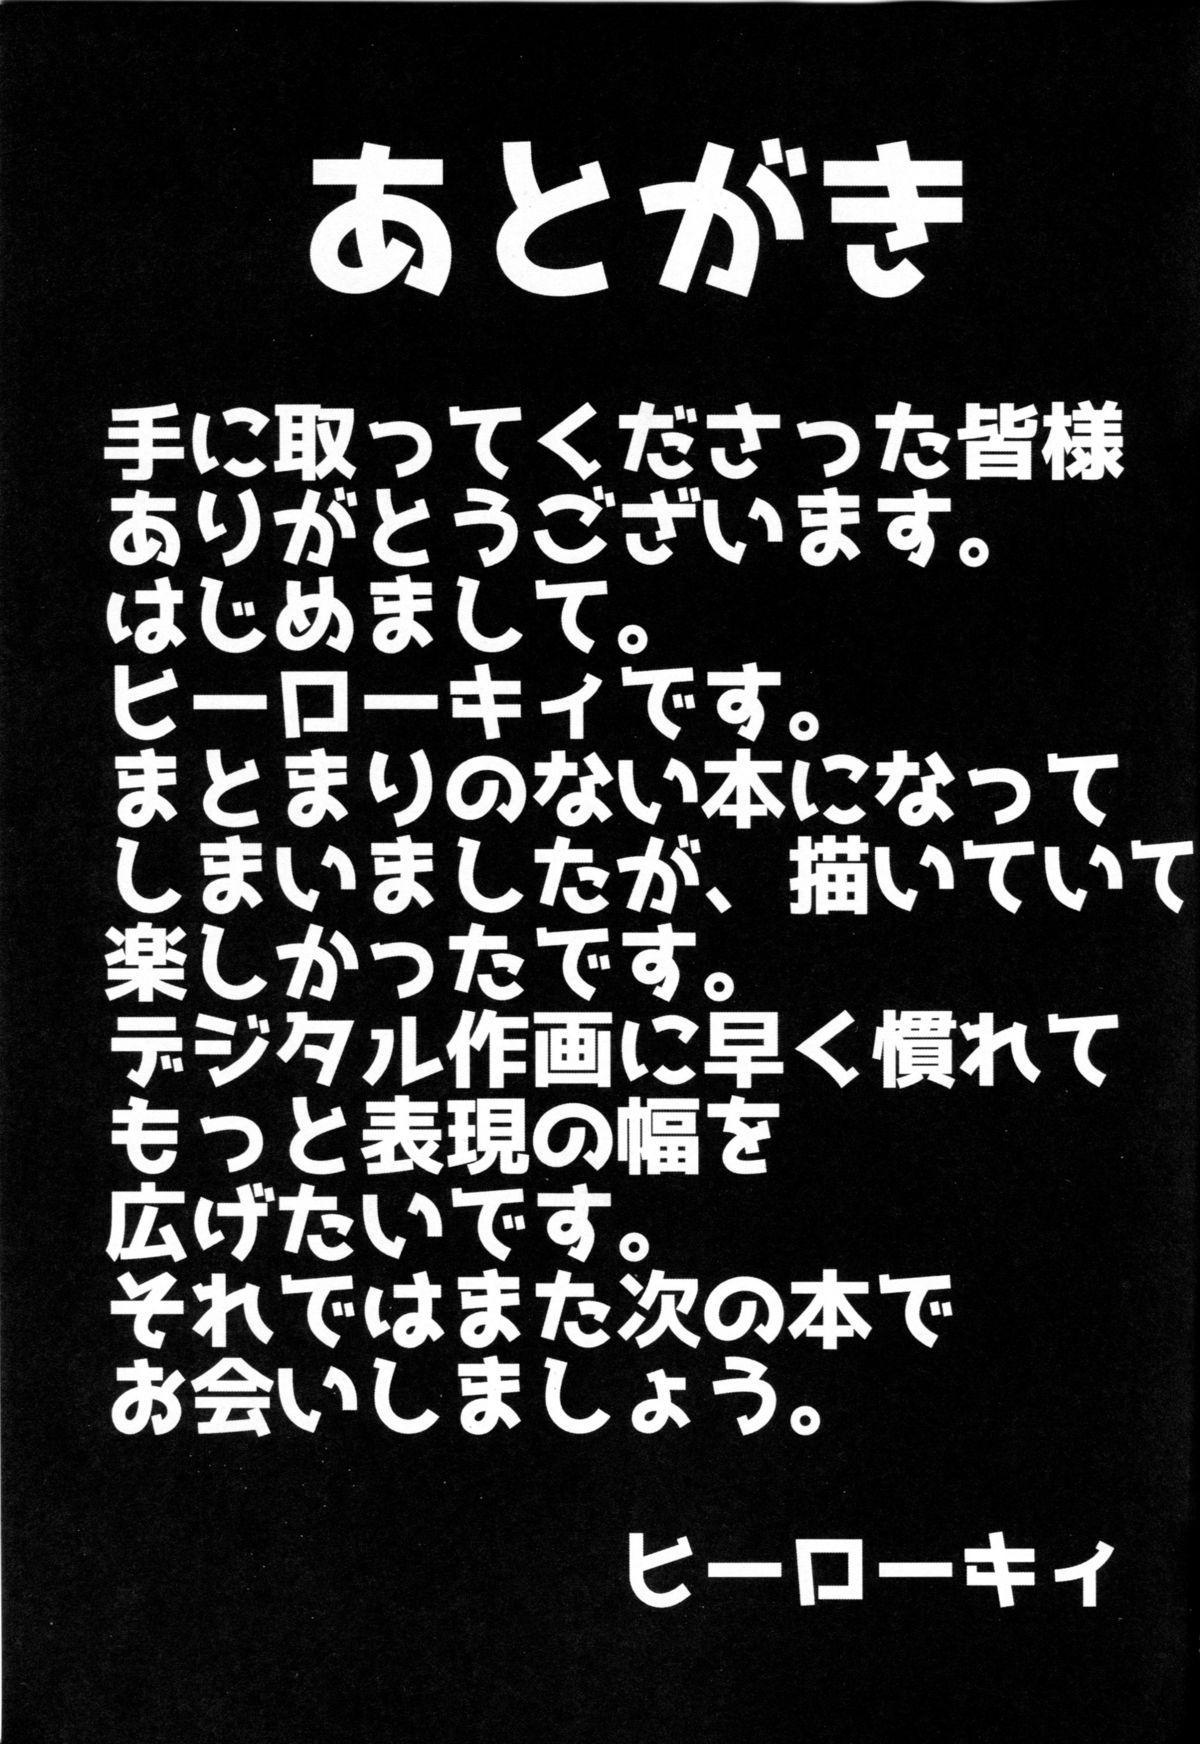 Saredo Uraraka ni! Ikari no Gachimacchi - Still Behave Uraraka! 24